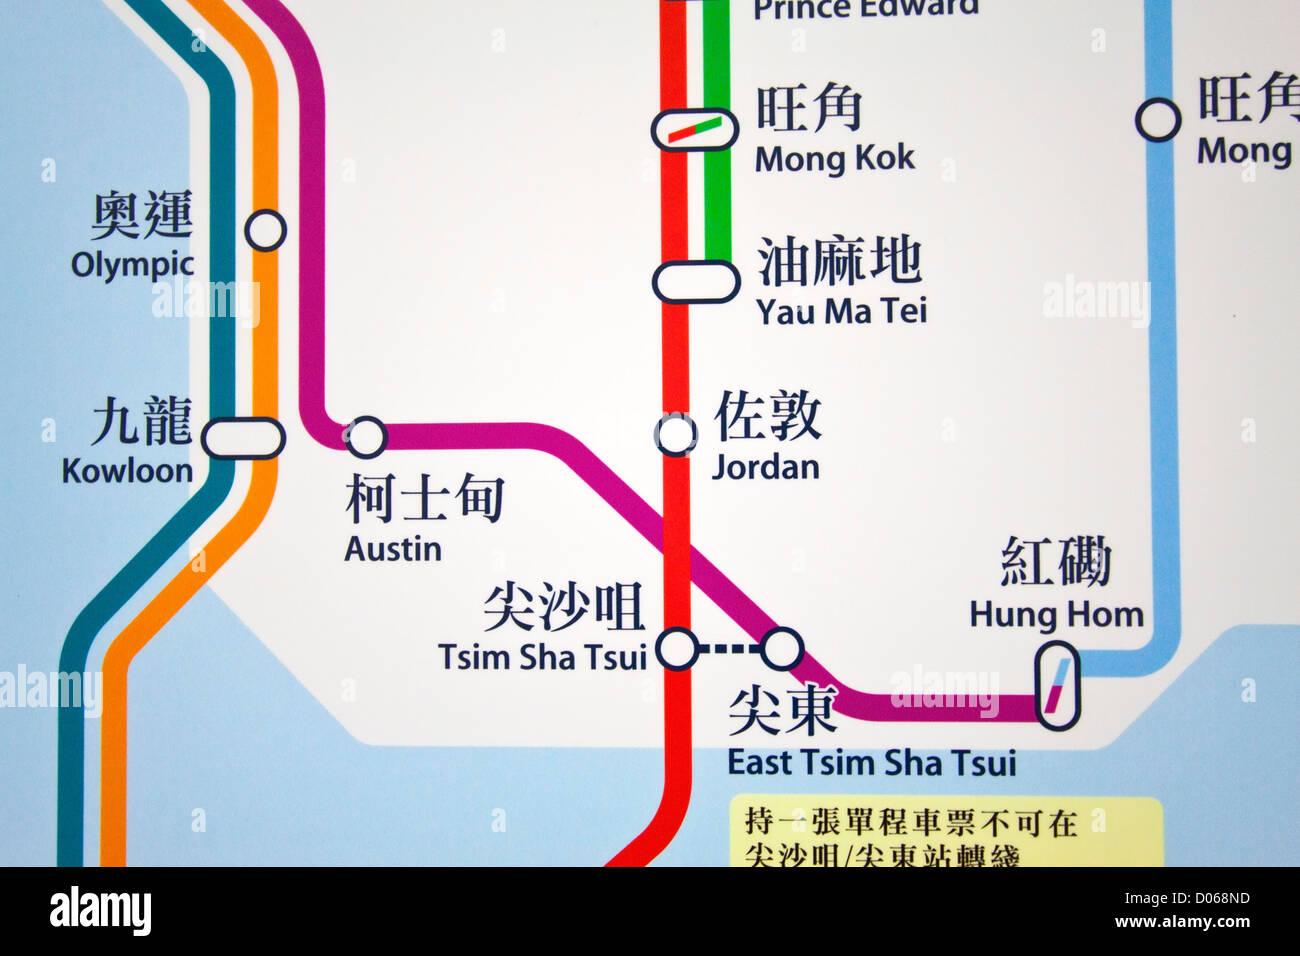 HONG KONG JAN 17 Hong Kong MTR route map in a MTR station in Hong